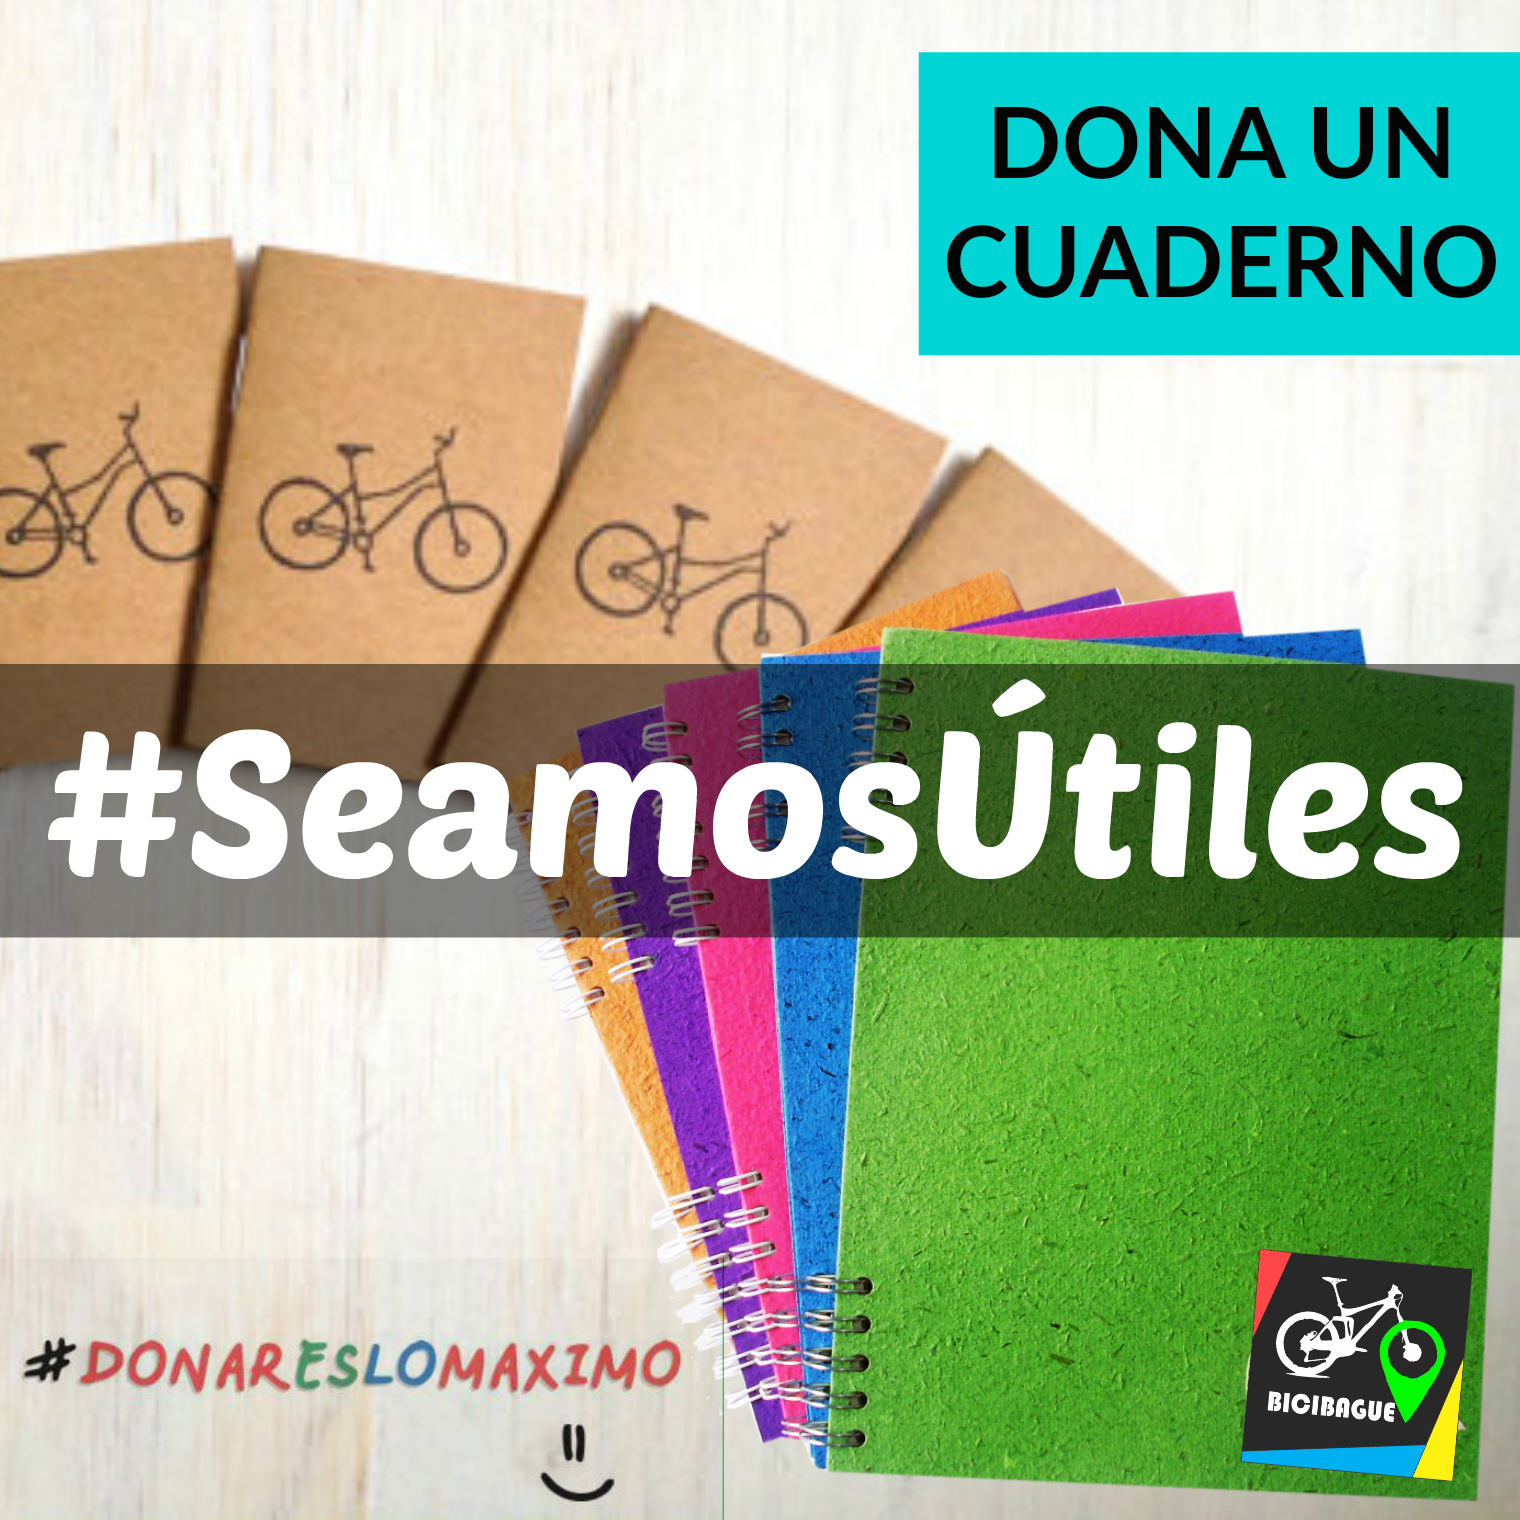 Seamos_utiles